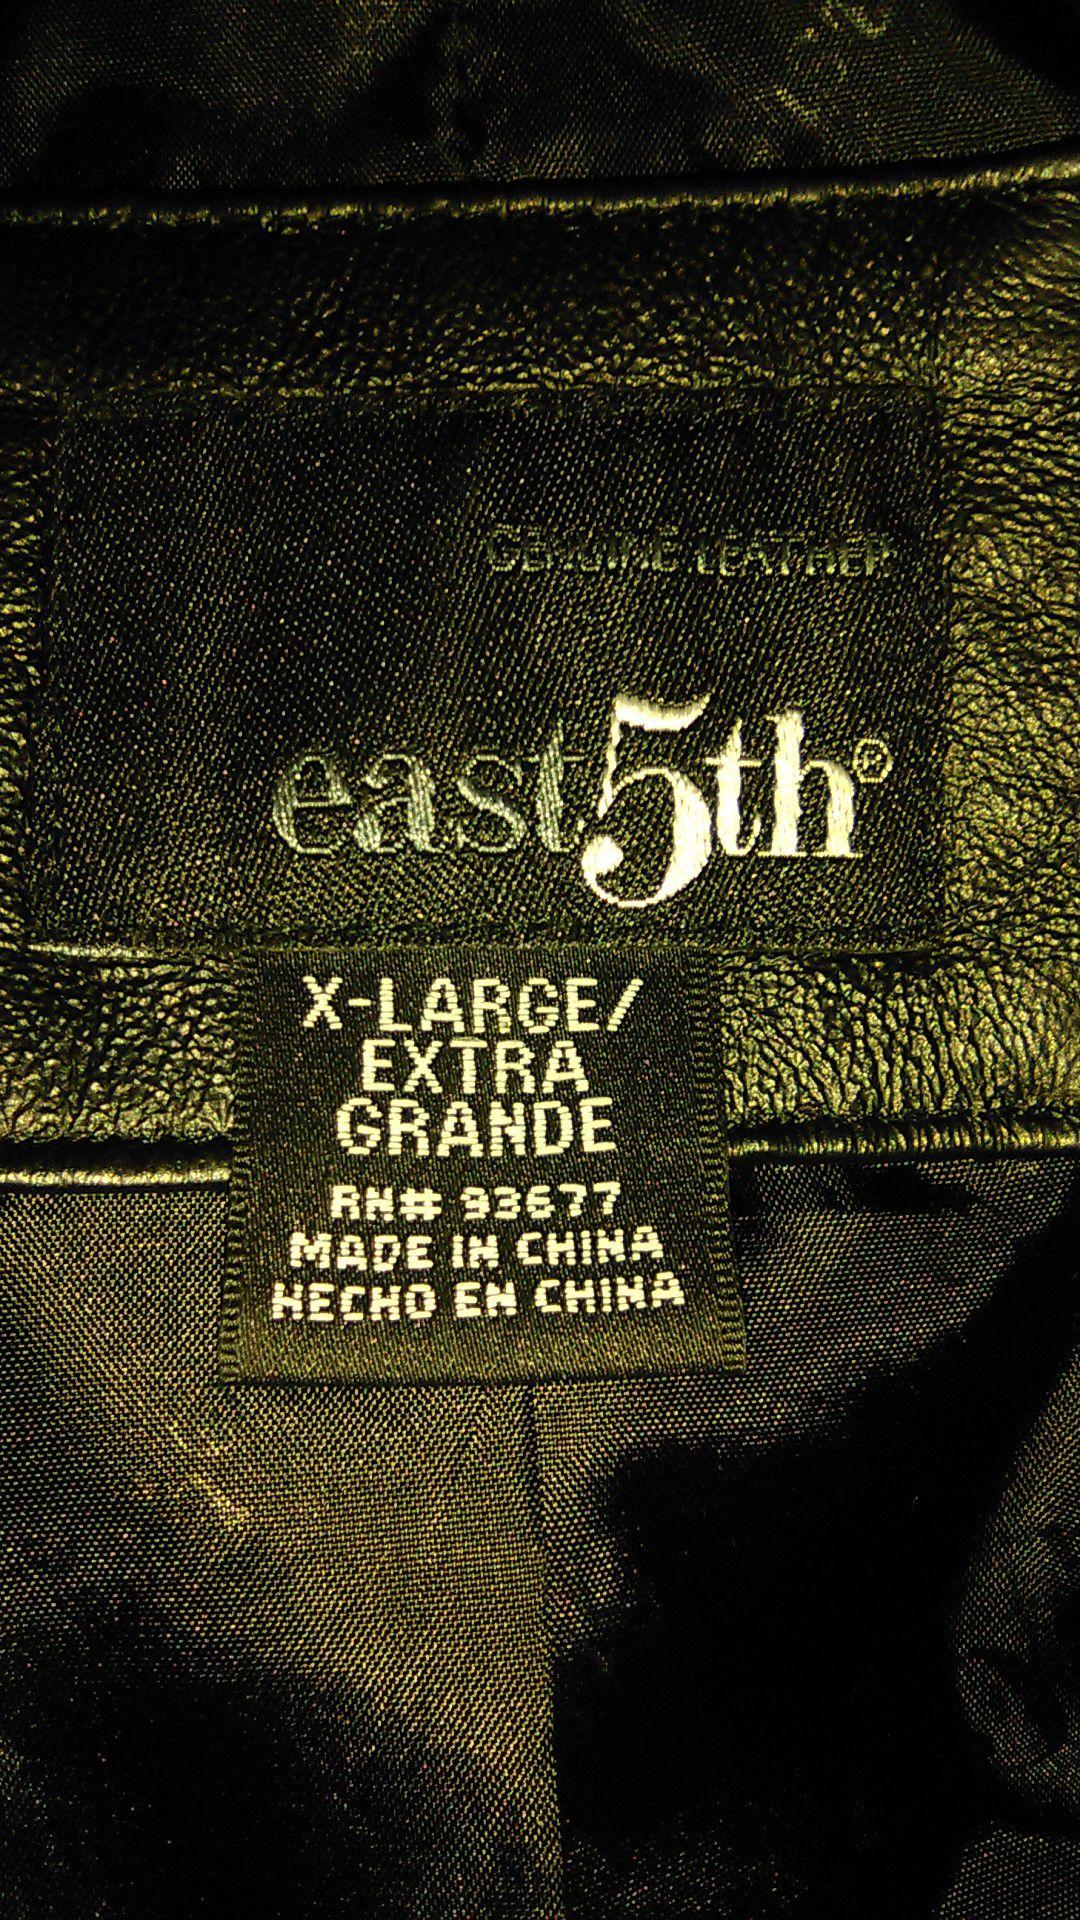 East 5th genuine leather jacket size extra large